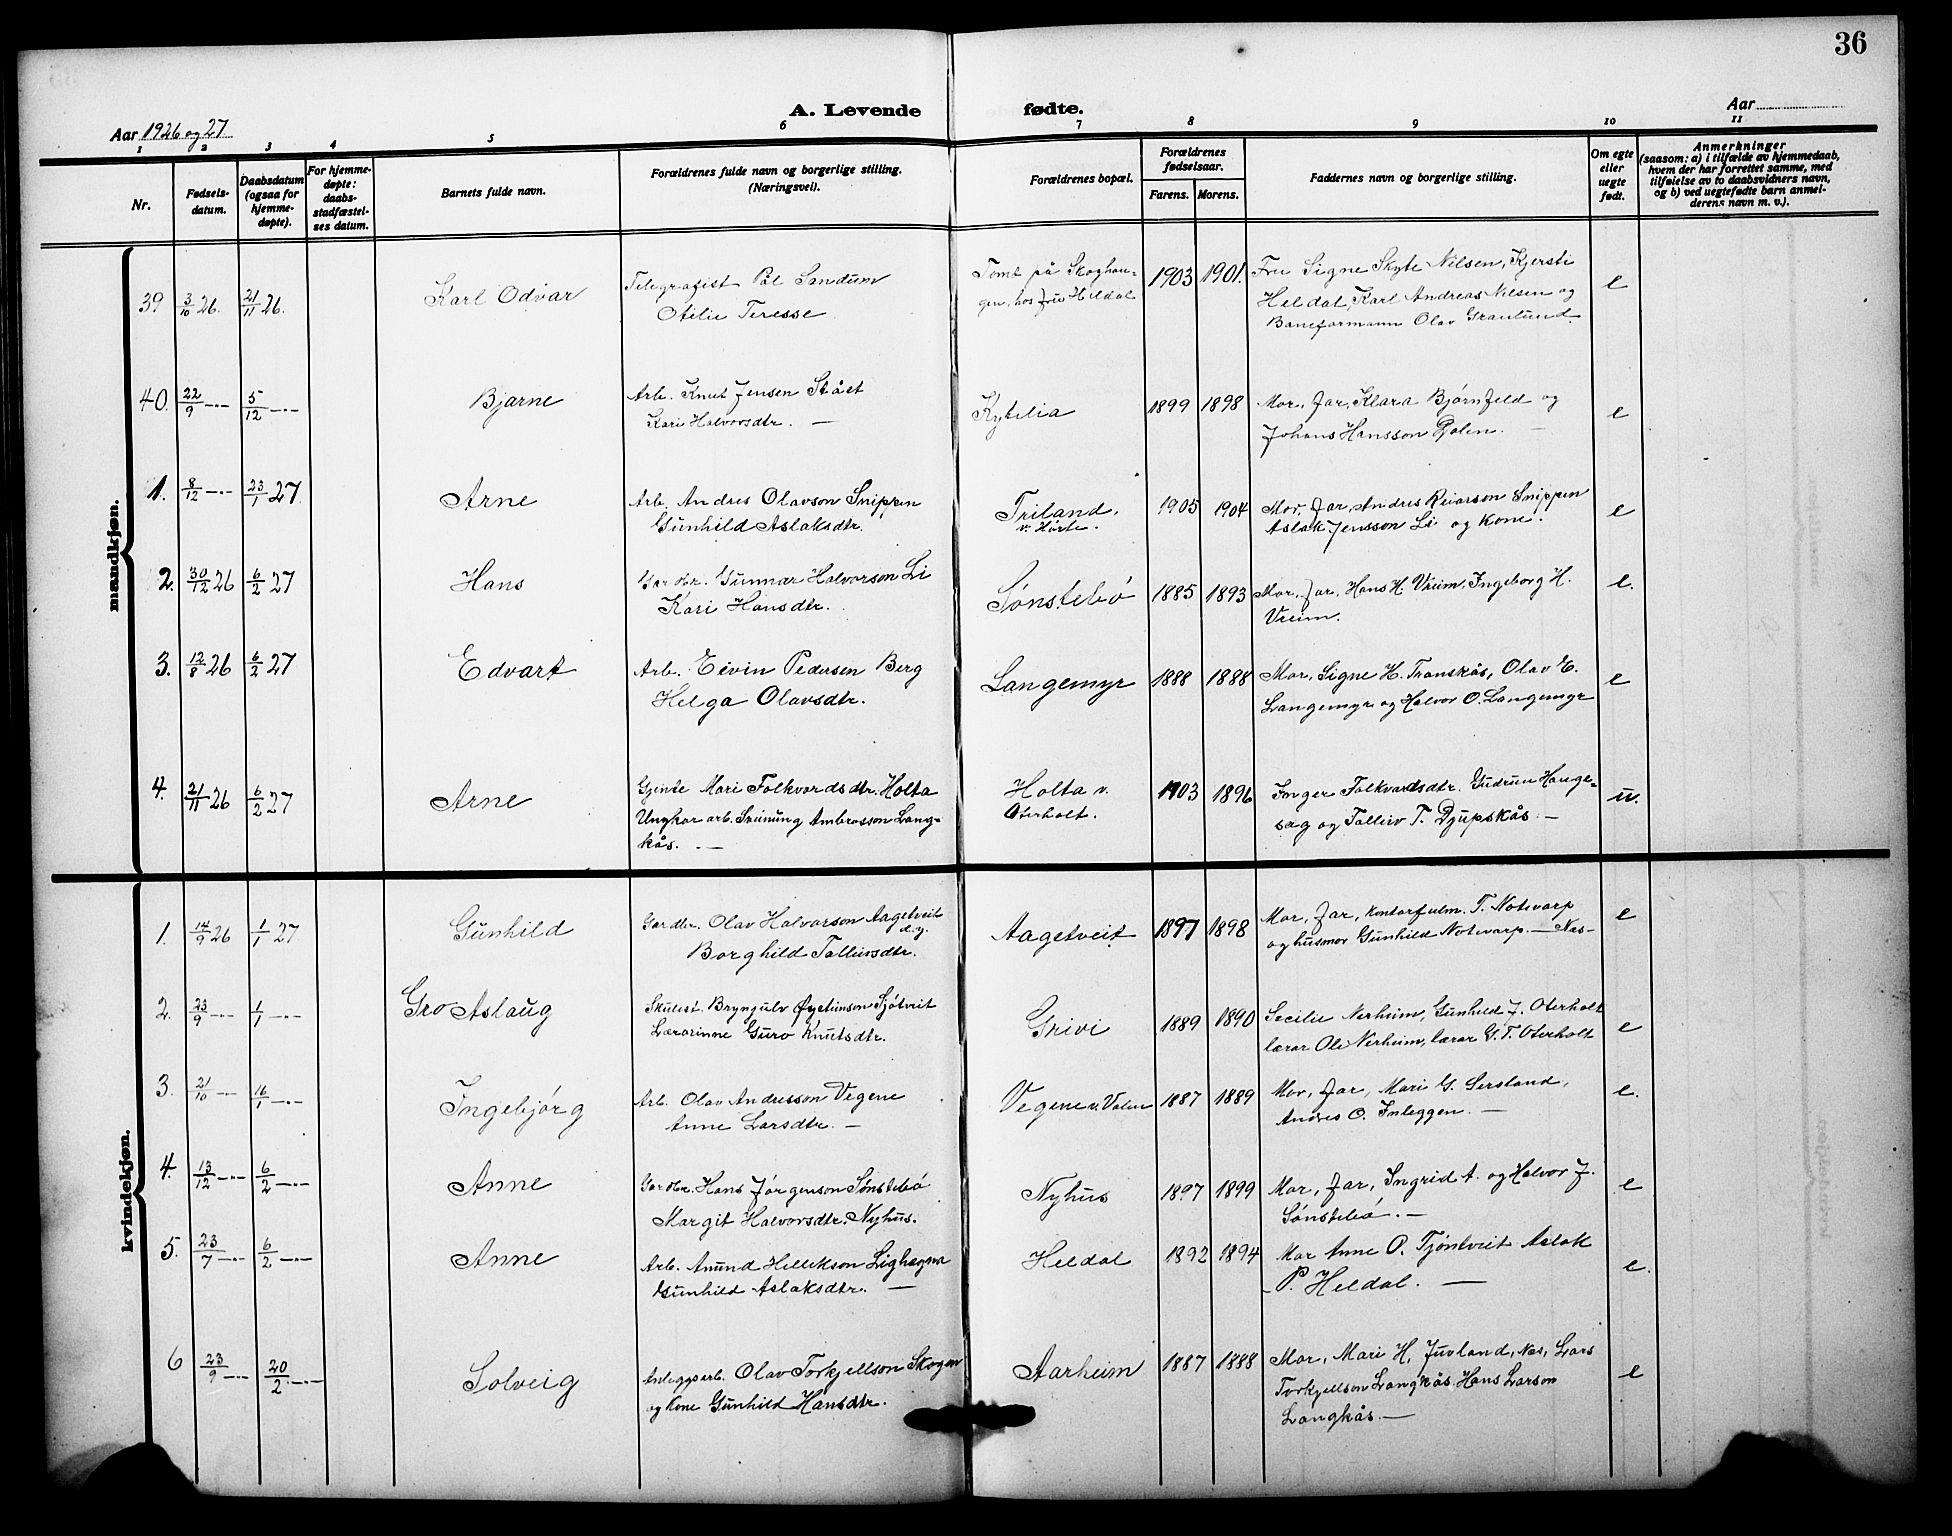 SAKO, Bø kirkebøker, G/Ga/L0008: Klokkerbok nr. 8, 1920-1930, s. 36